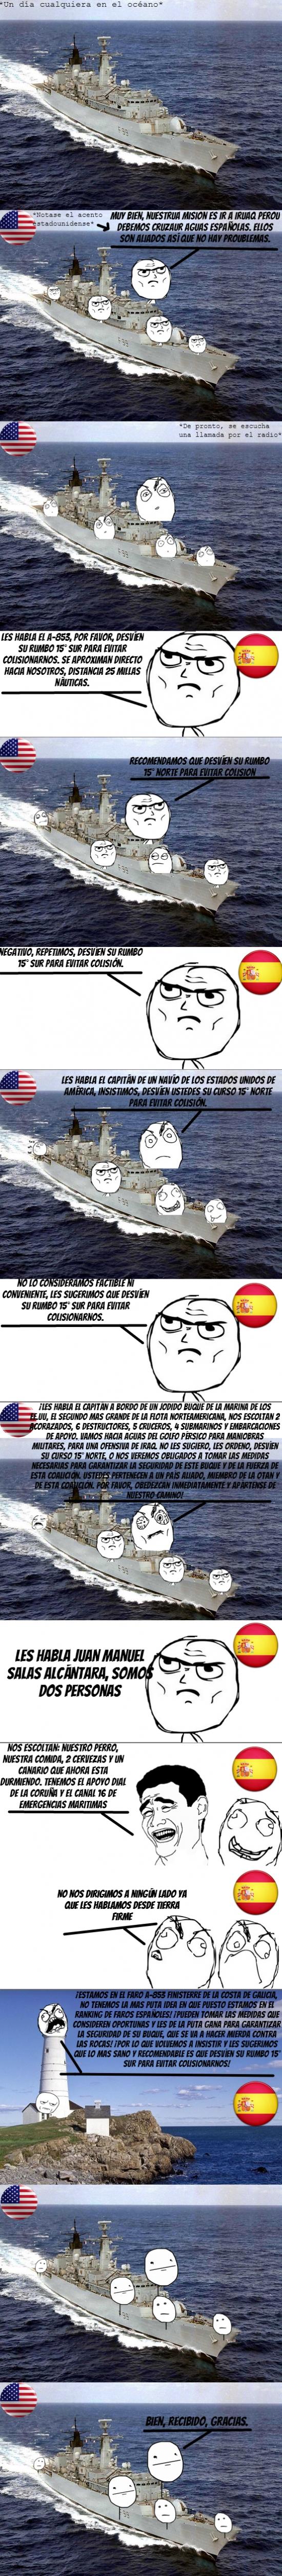 barcos,españa,fuuuuu,gringolandia,marinos,me gusta,oceano,poker face,soldados,yaoming,youtube